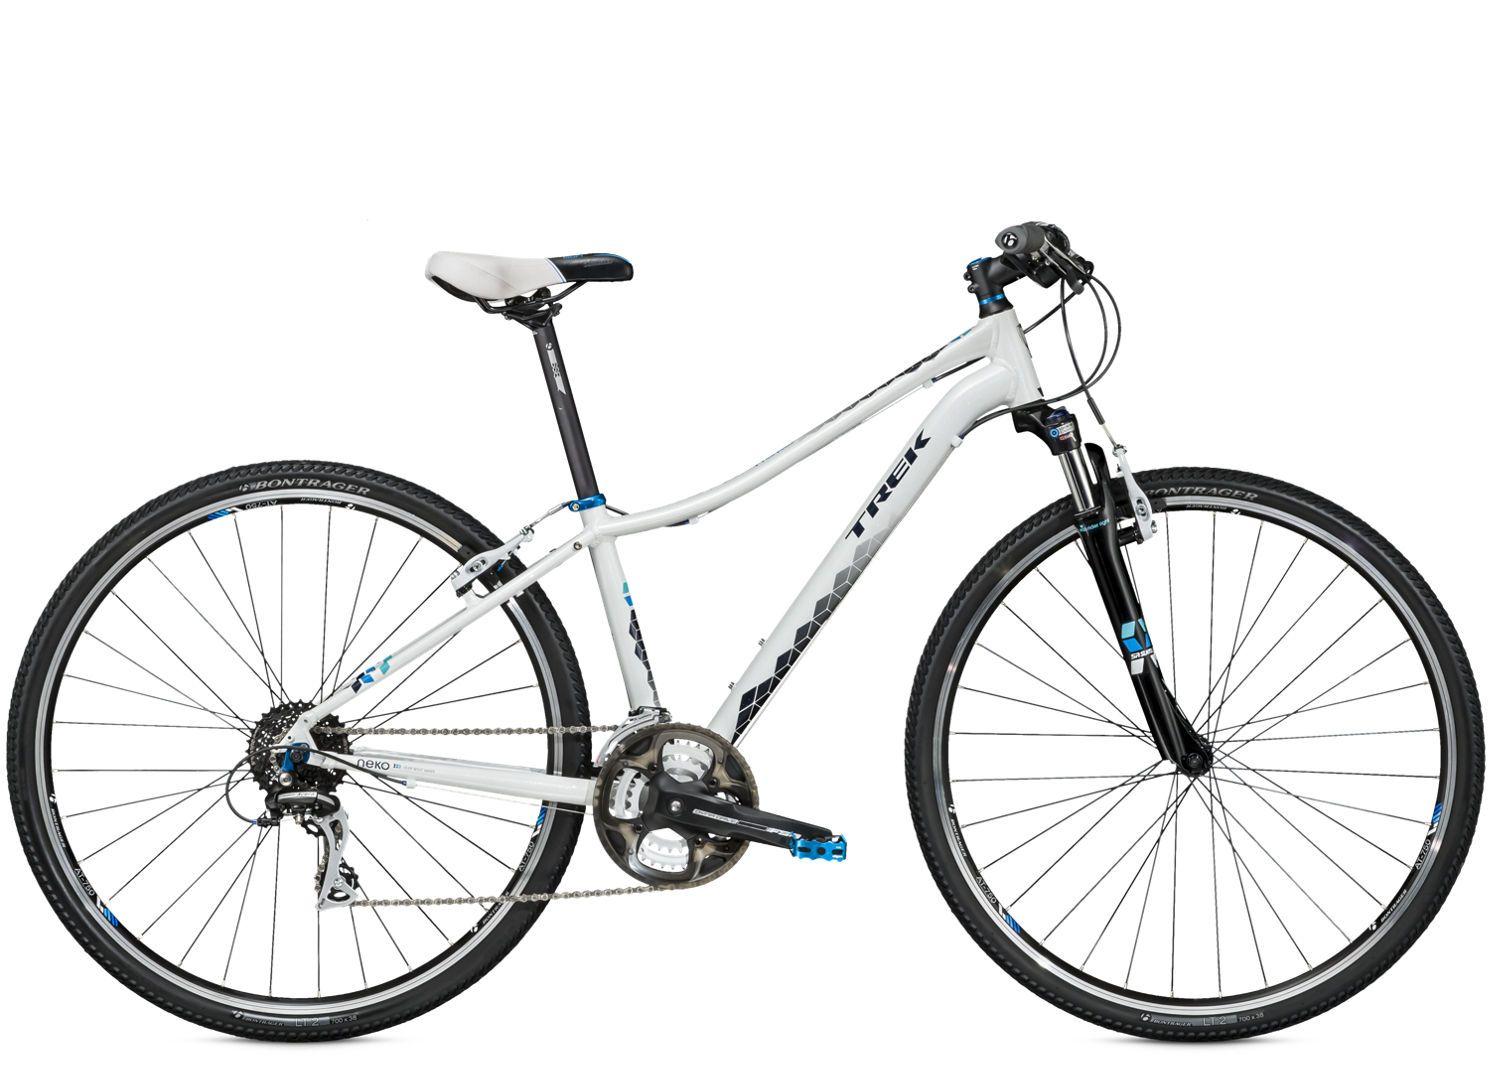 Neko Is A Perfect Hybrid Part Refined Women S City Bike Part